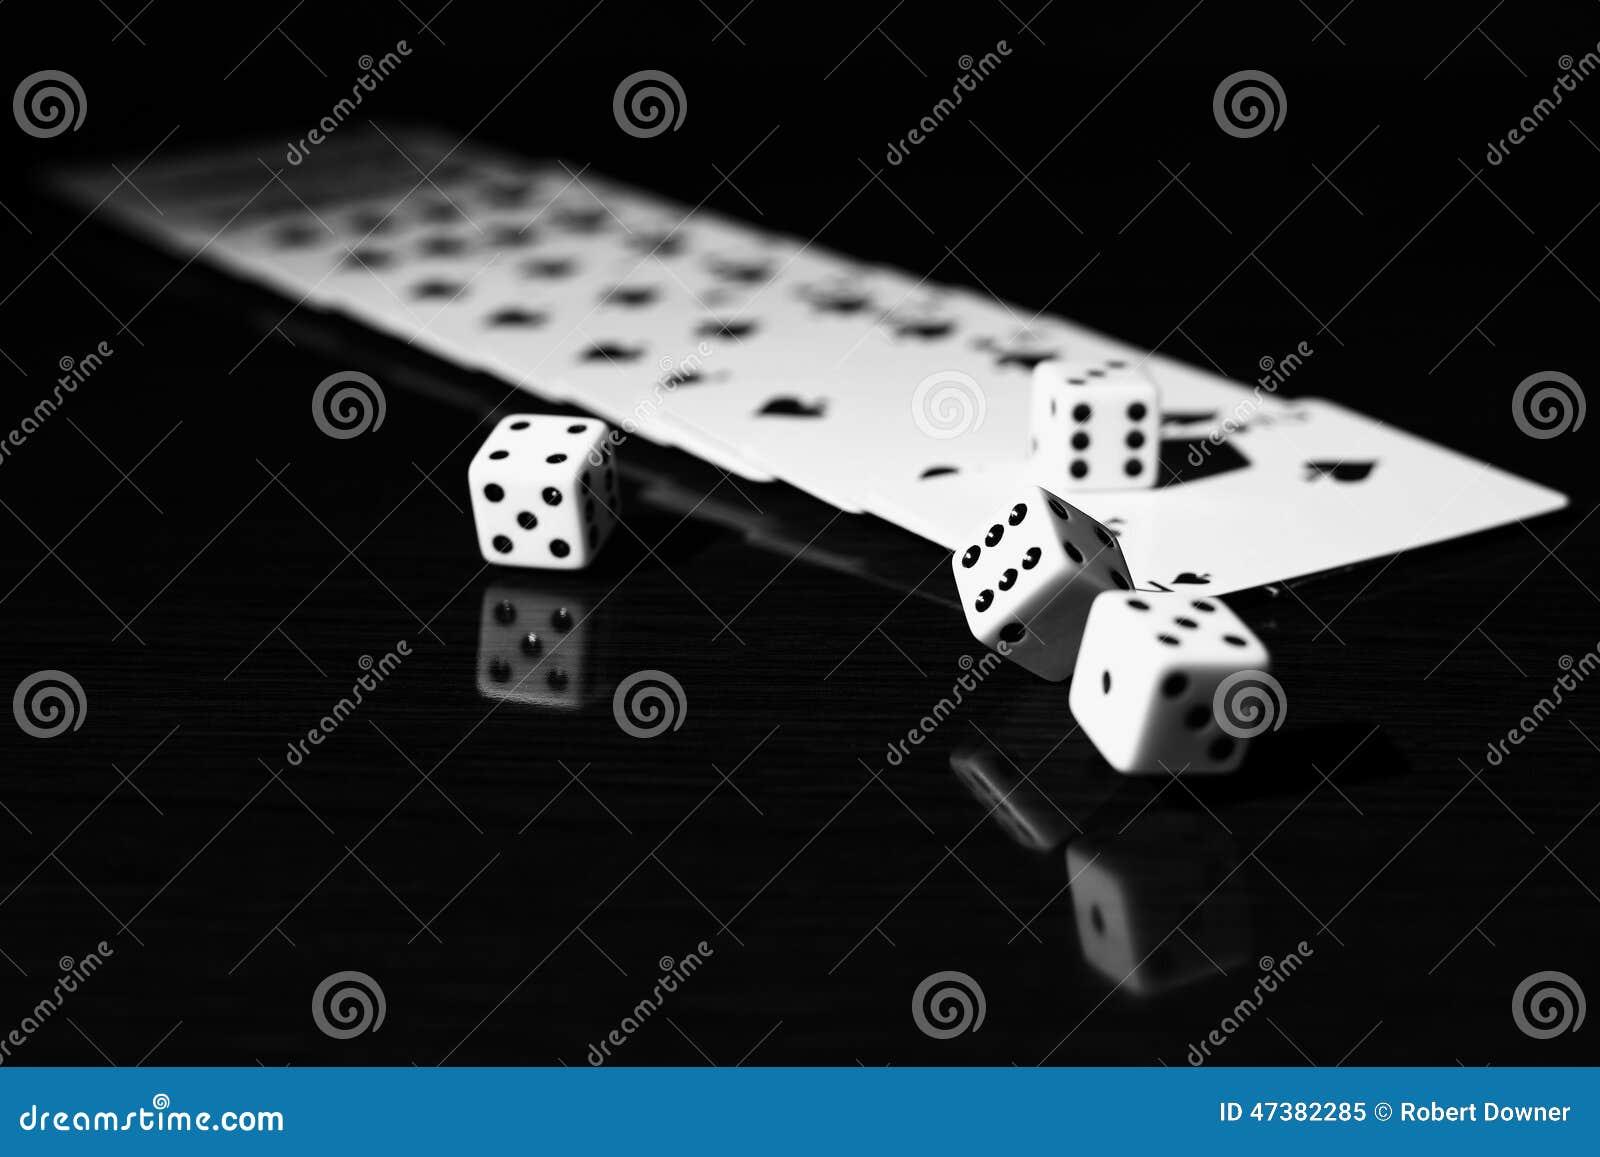 4 immagini una parola roulette dadi